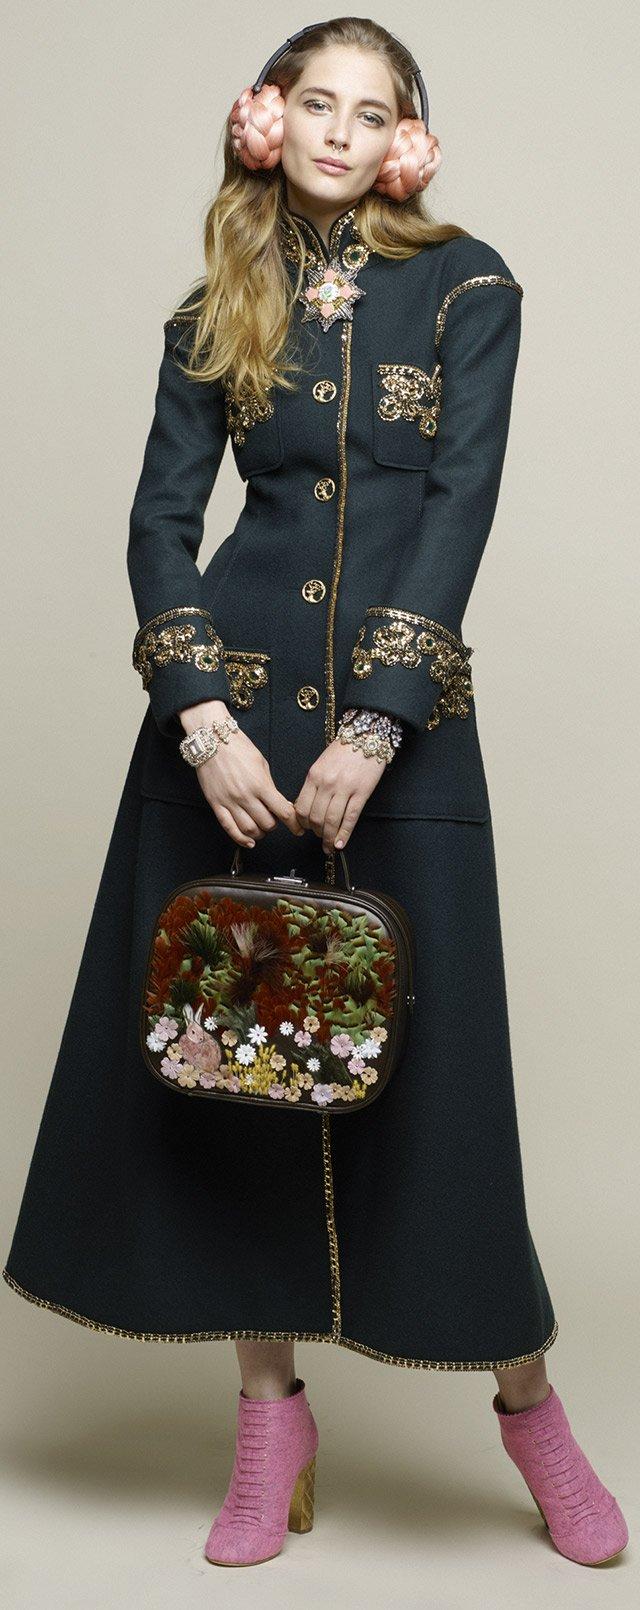 Chanel-Metiers-D'Art-Paris-Salzburg-2014-2015-Bag